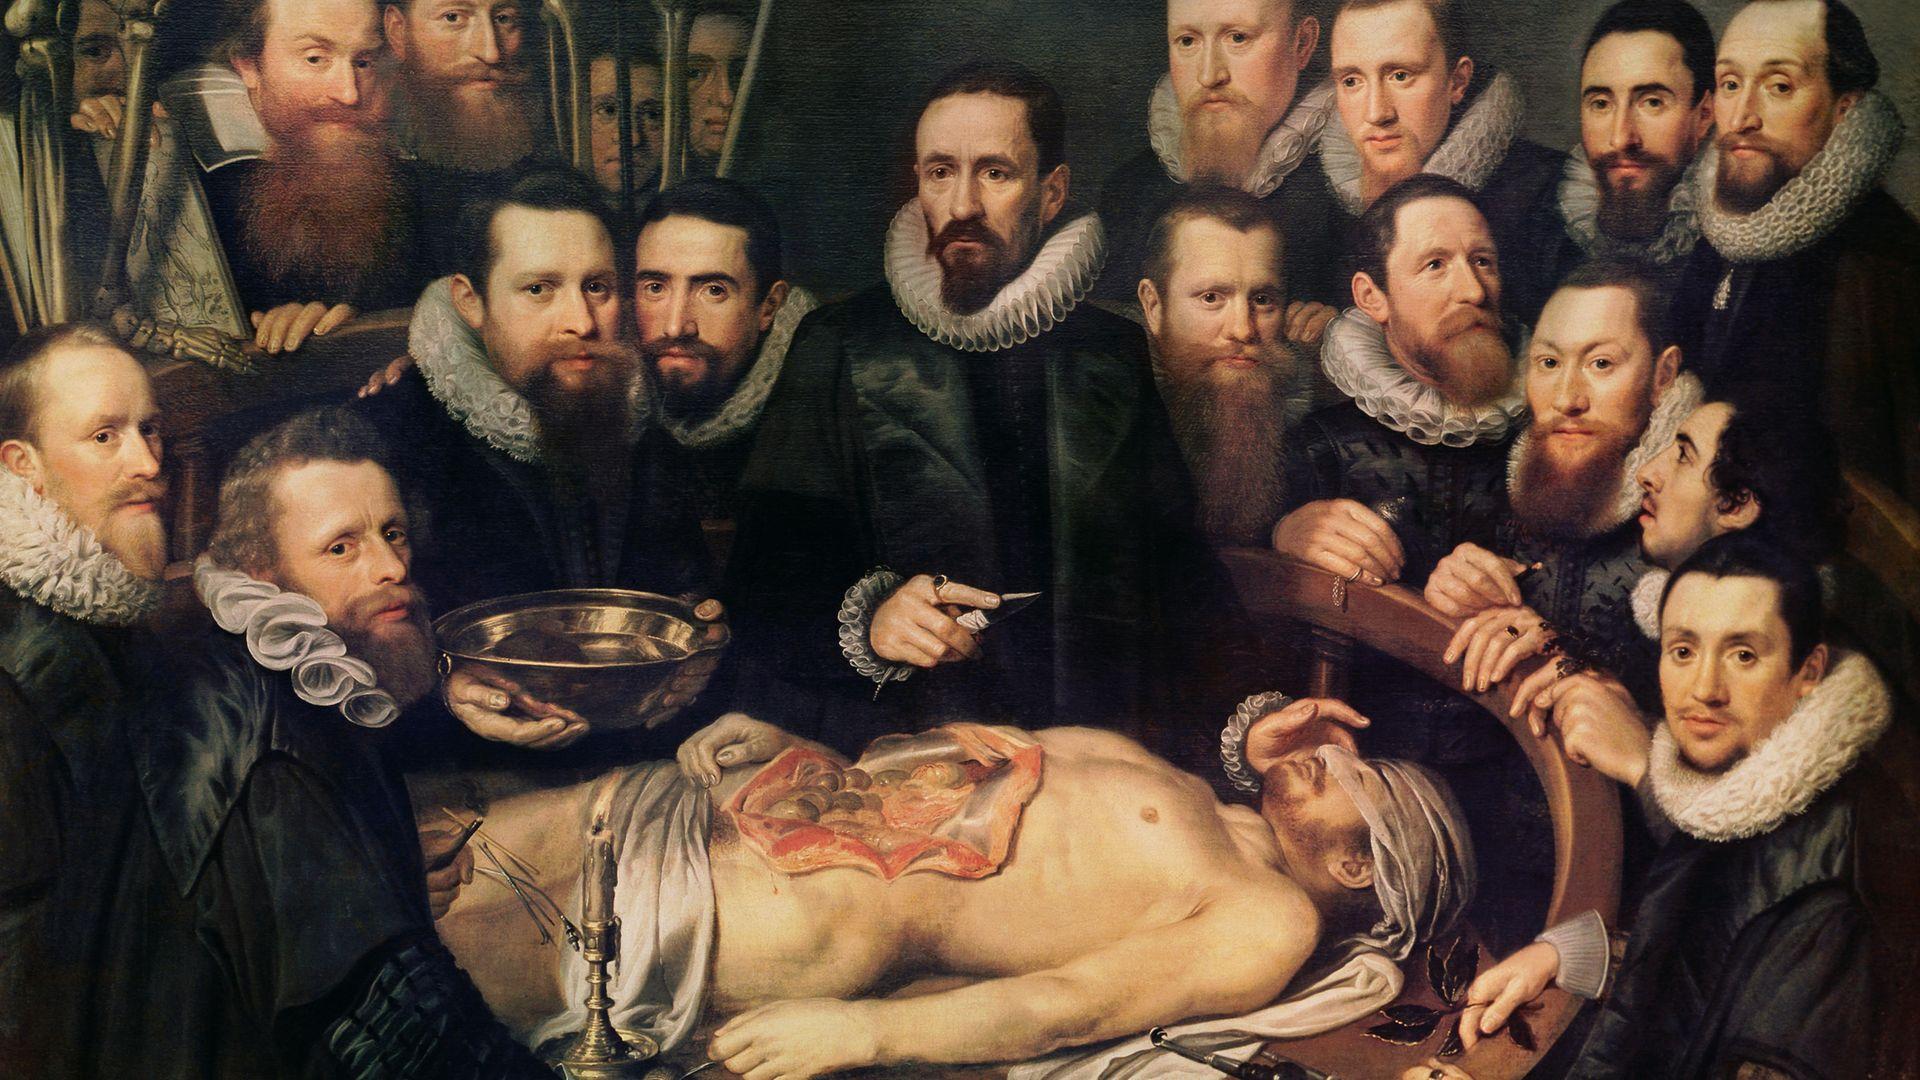 The Anatomy Lesson of Doctor Willem van der Meer in Delft - Credit: Art Images via Getty Images